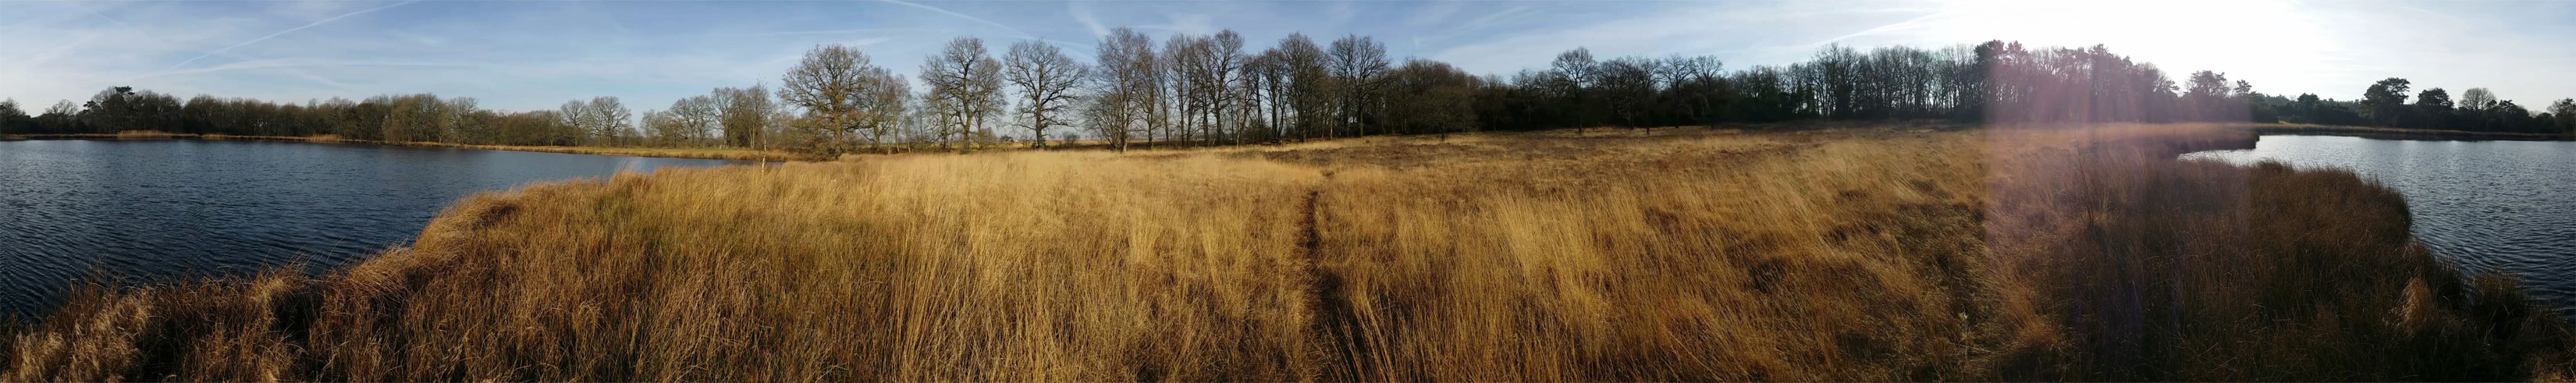 voetzoekers-kampsheide-panorama